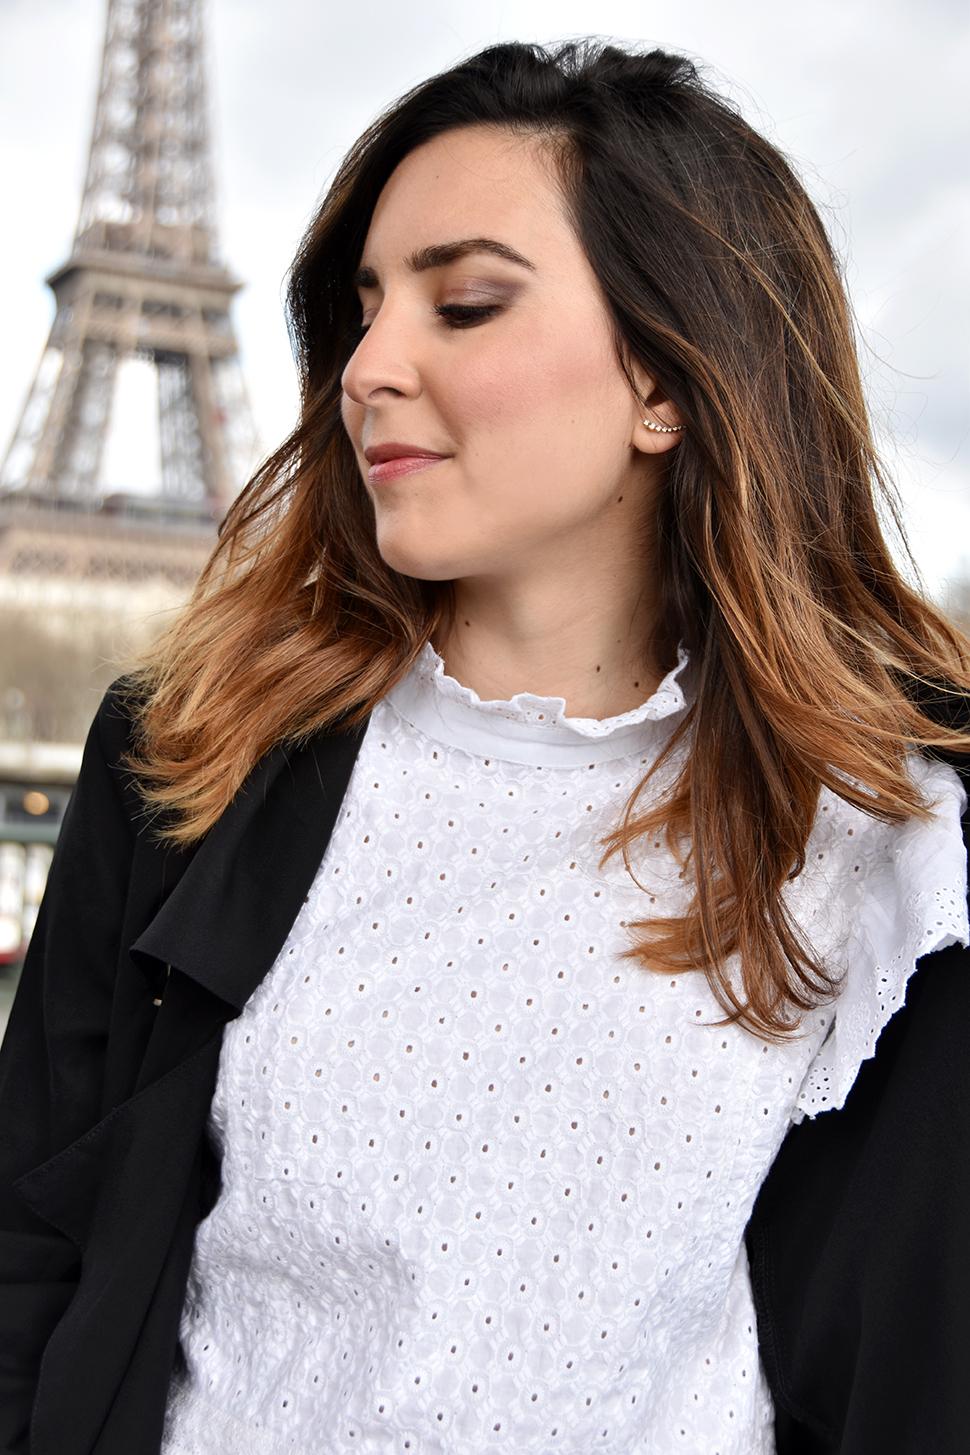 Helloitsvalentine_BirHakeim_Paris_12